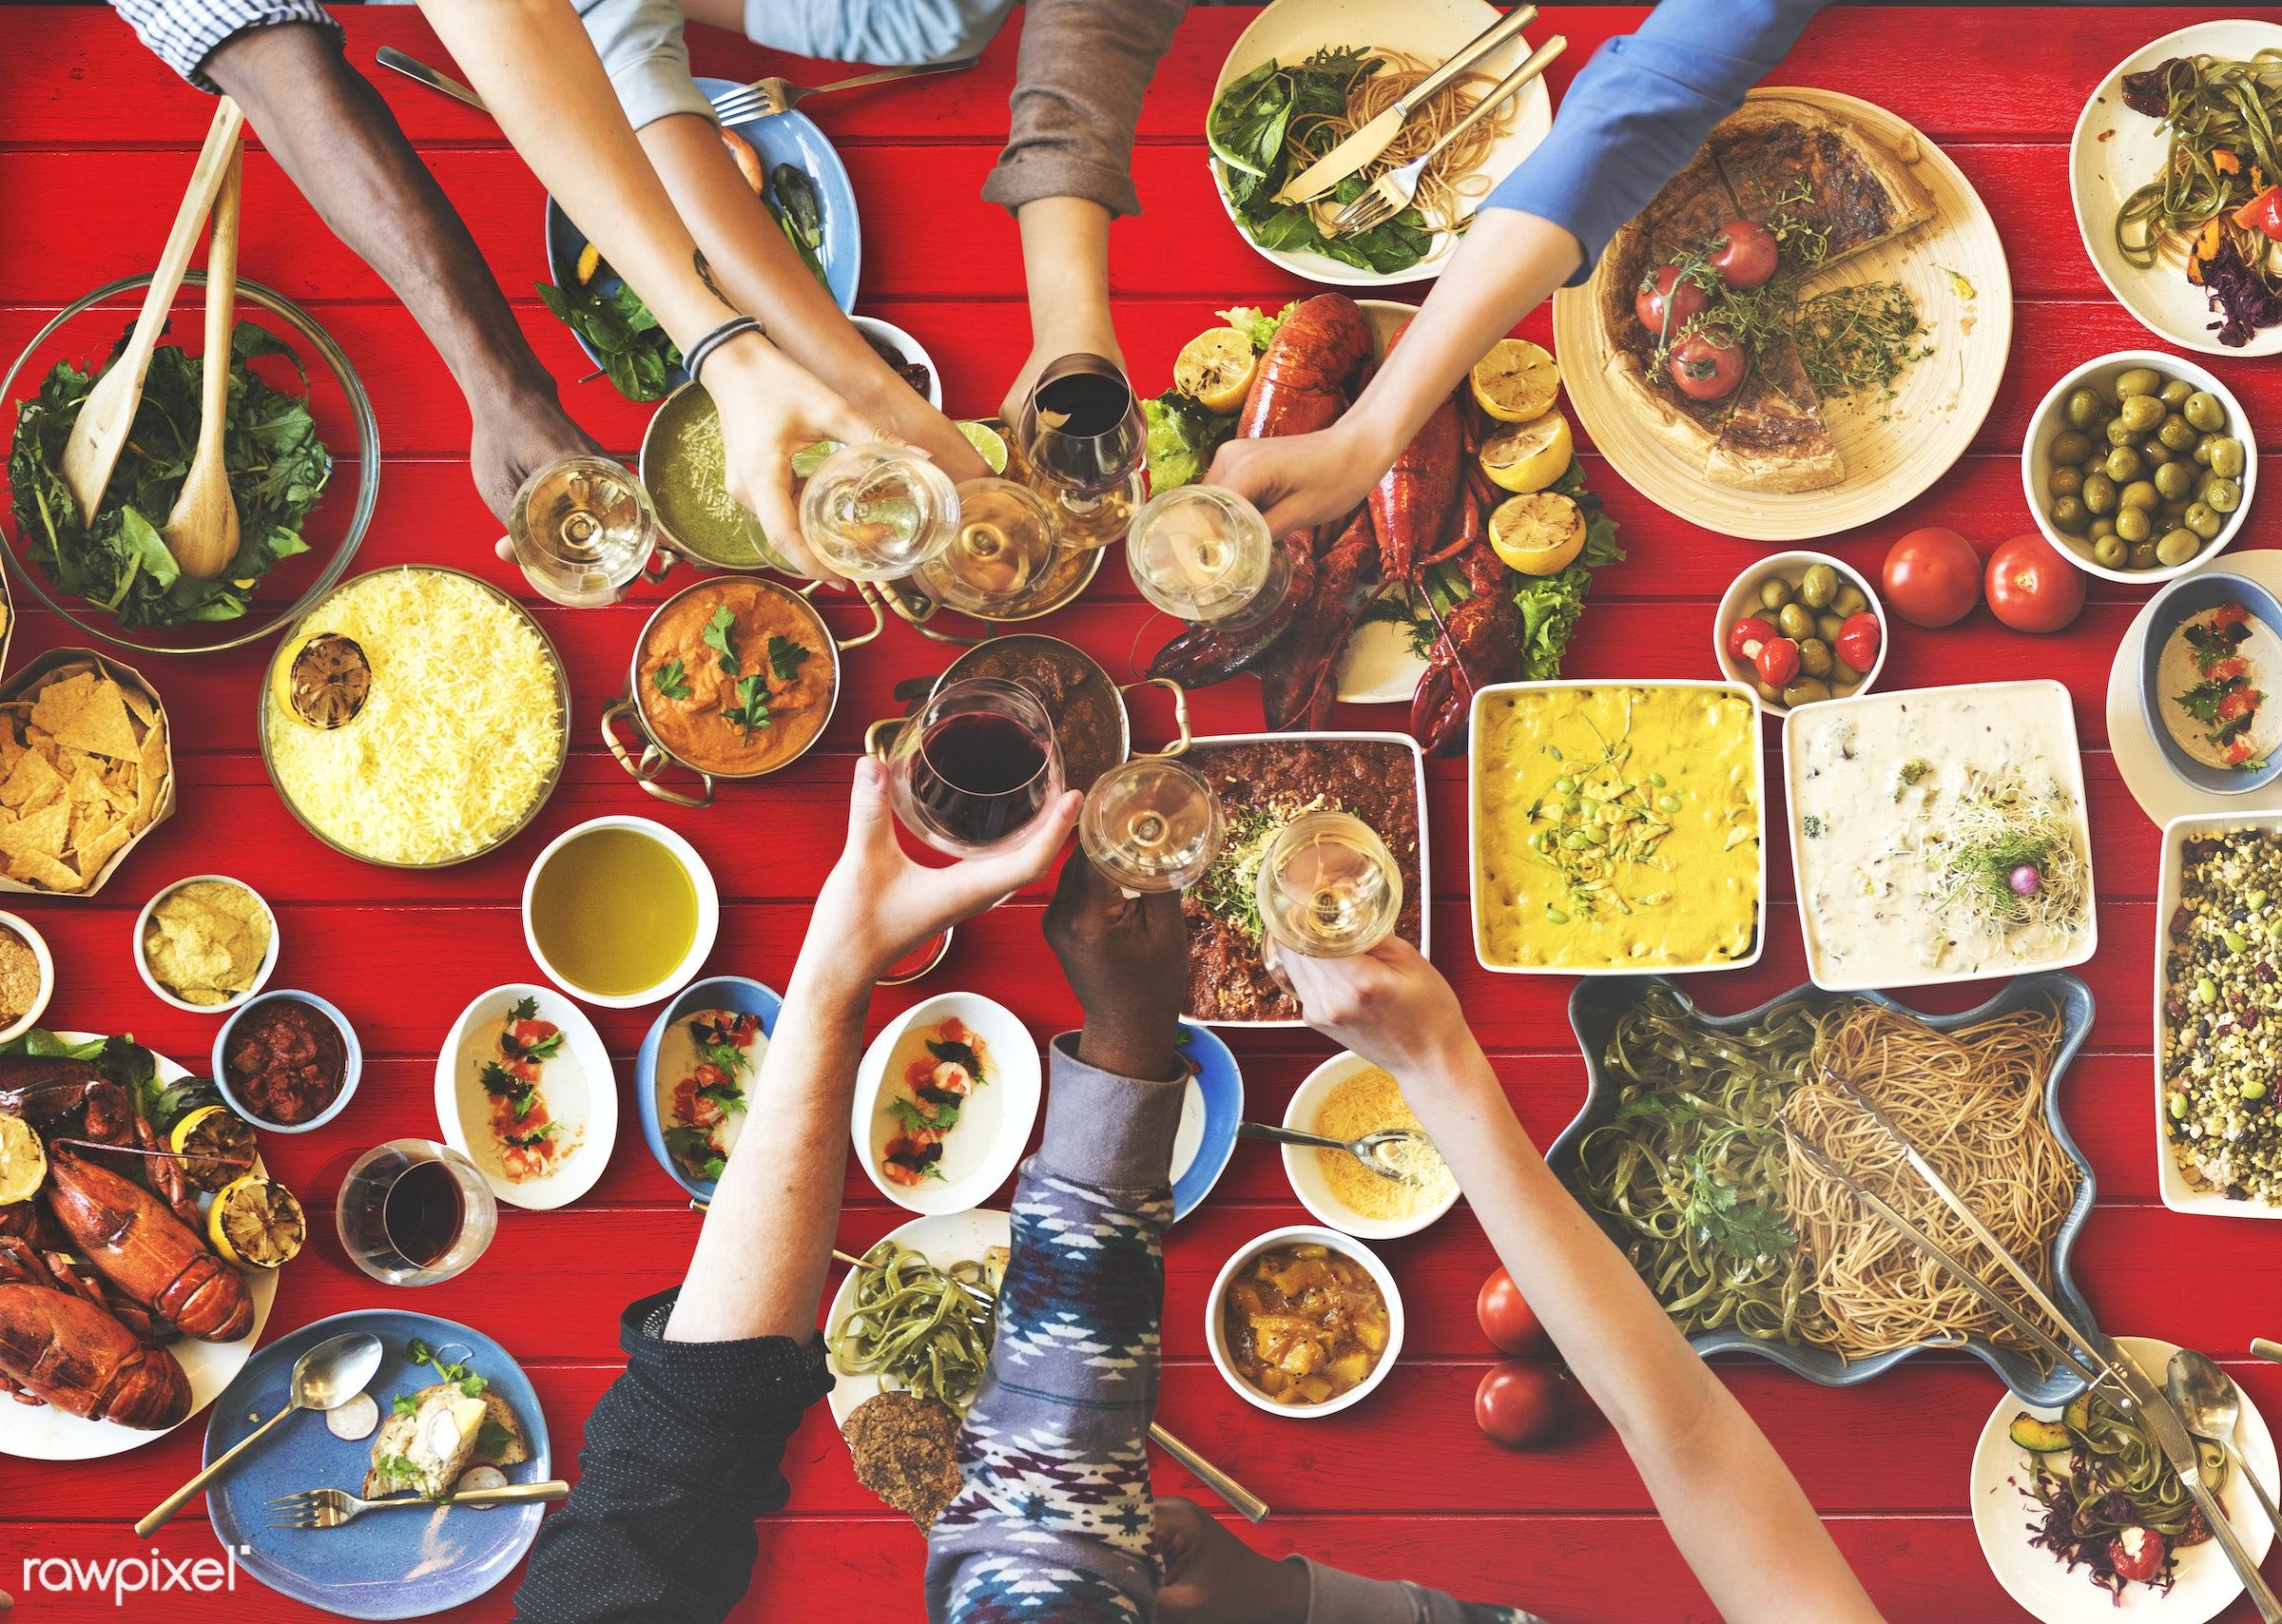 brunch, buffet, cafe, celebration, cheering, cheers, choice, crowd, dessert, diet, dining, dinner, diversity, drinking, eat...